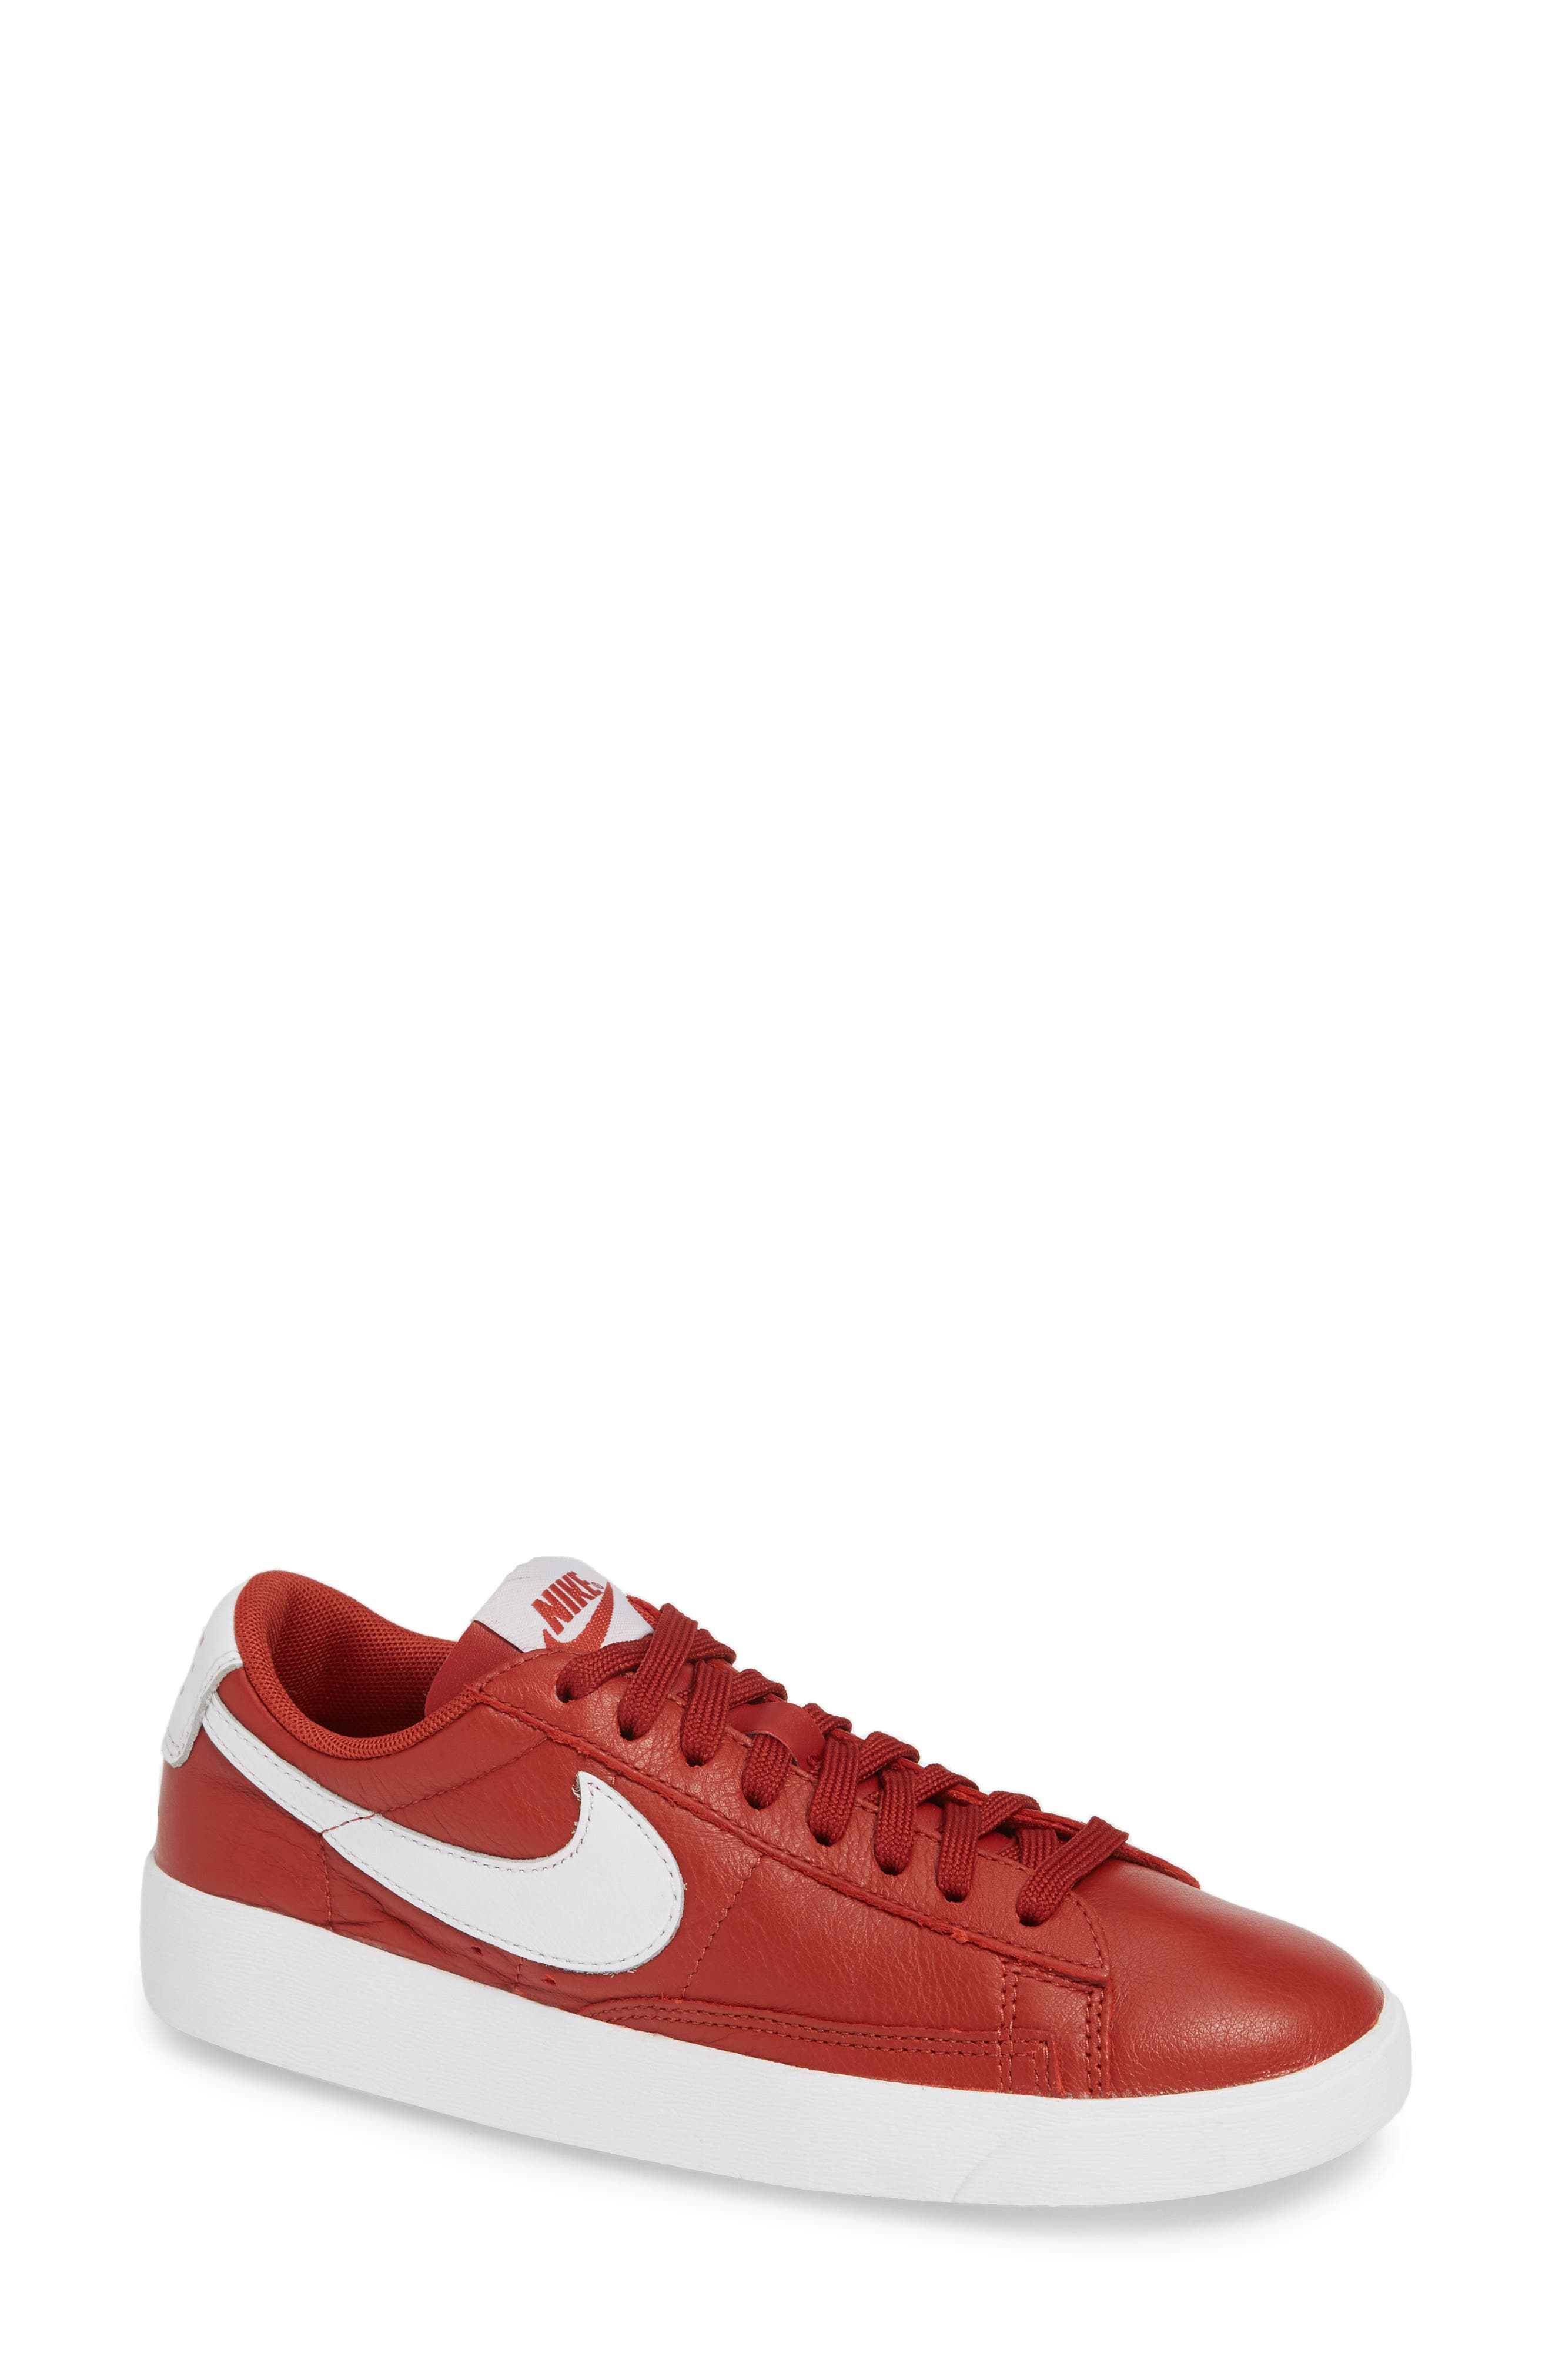 Blazer Low SE Sneaker,                         Main,                         color, DUNE RED/ WHITE-DUNE RED